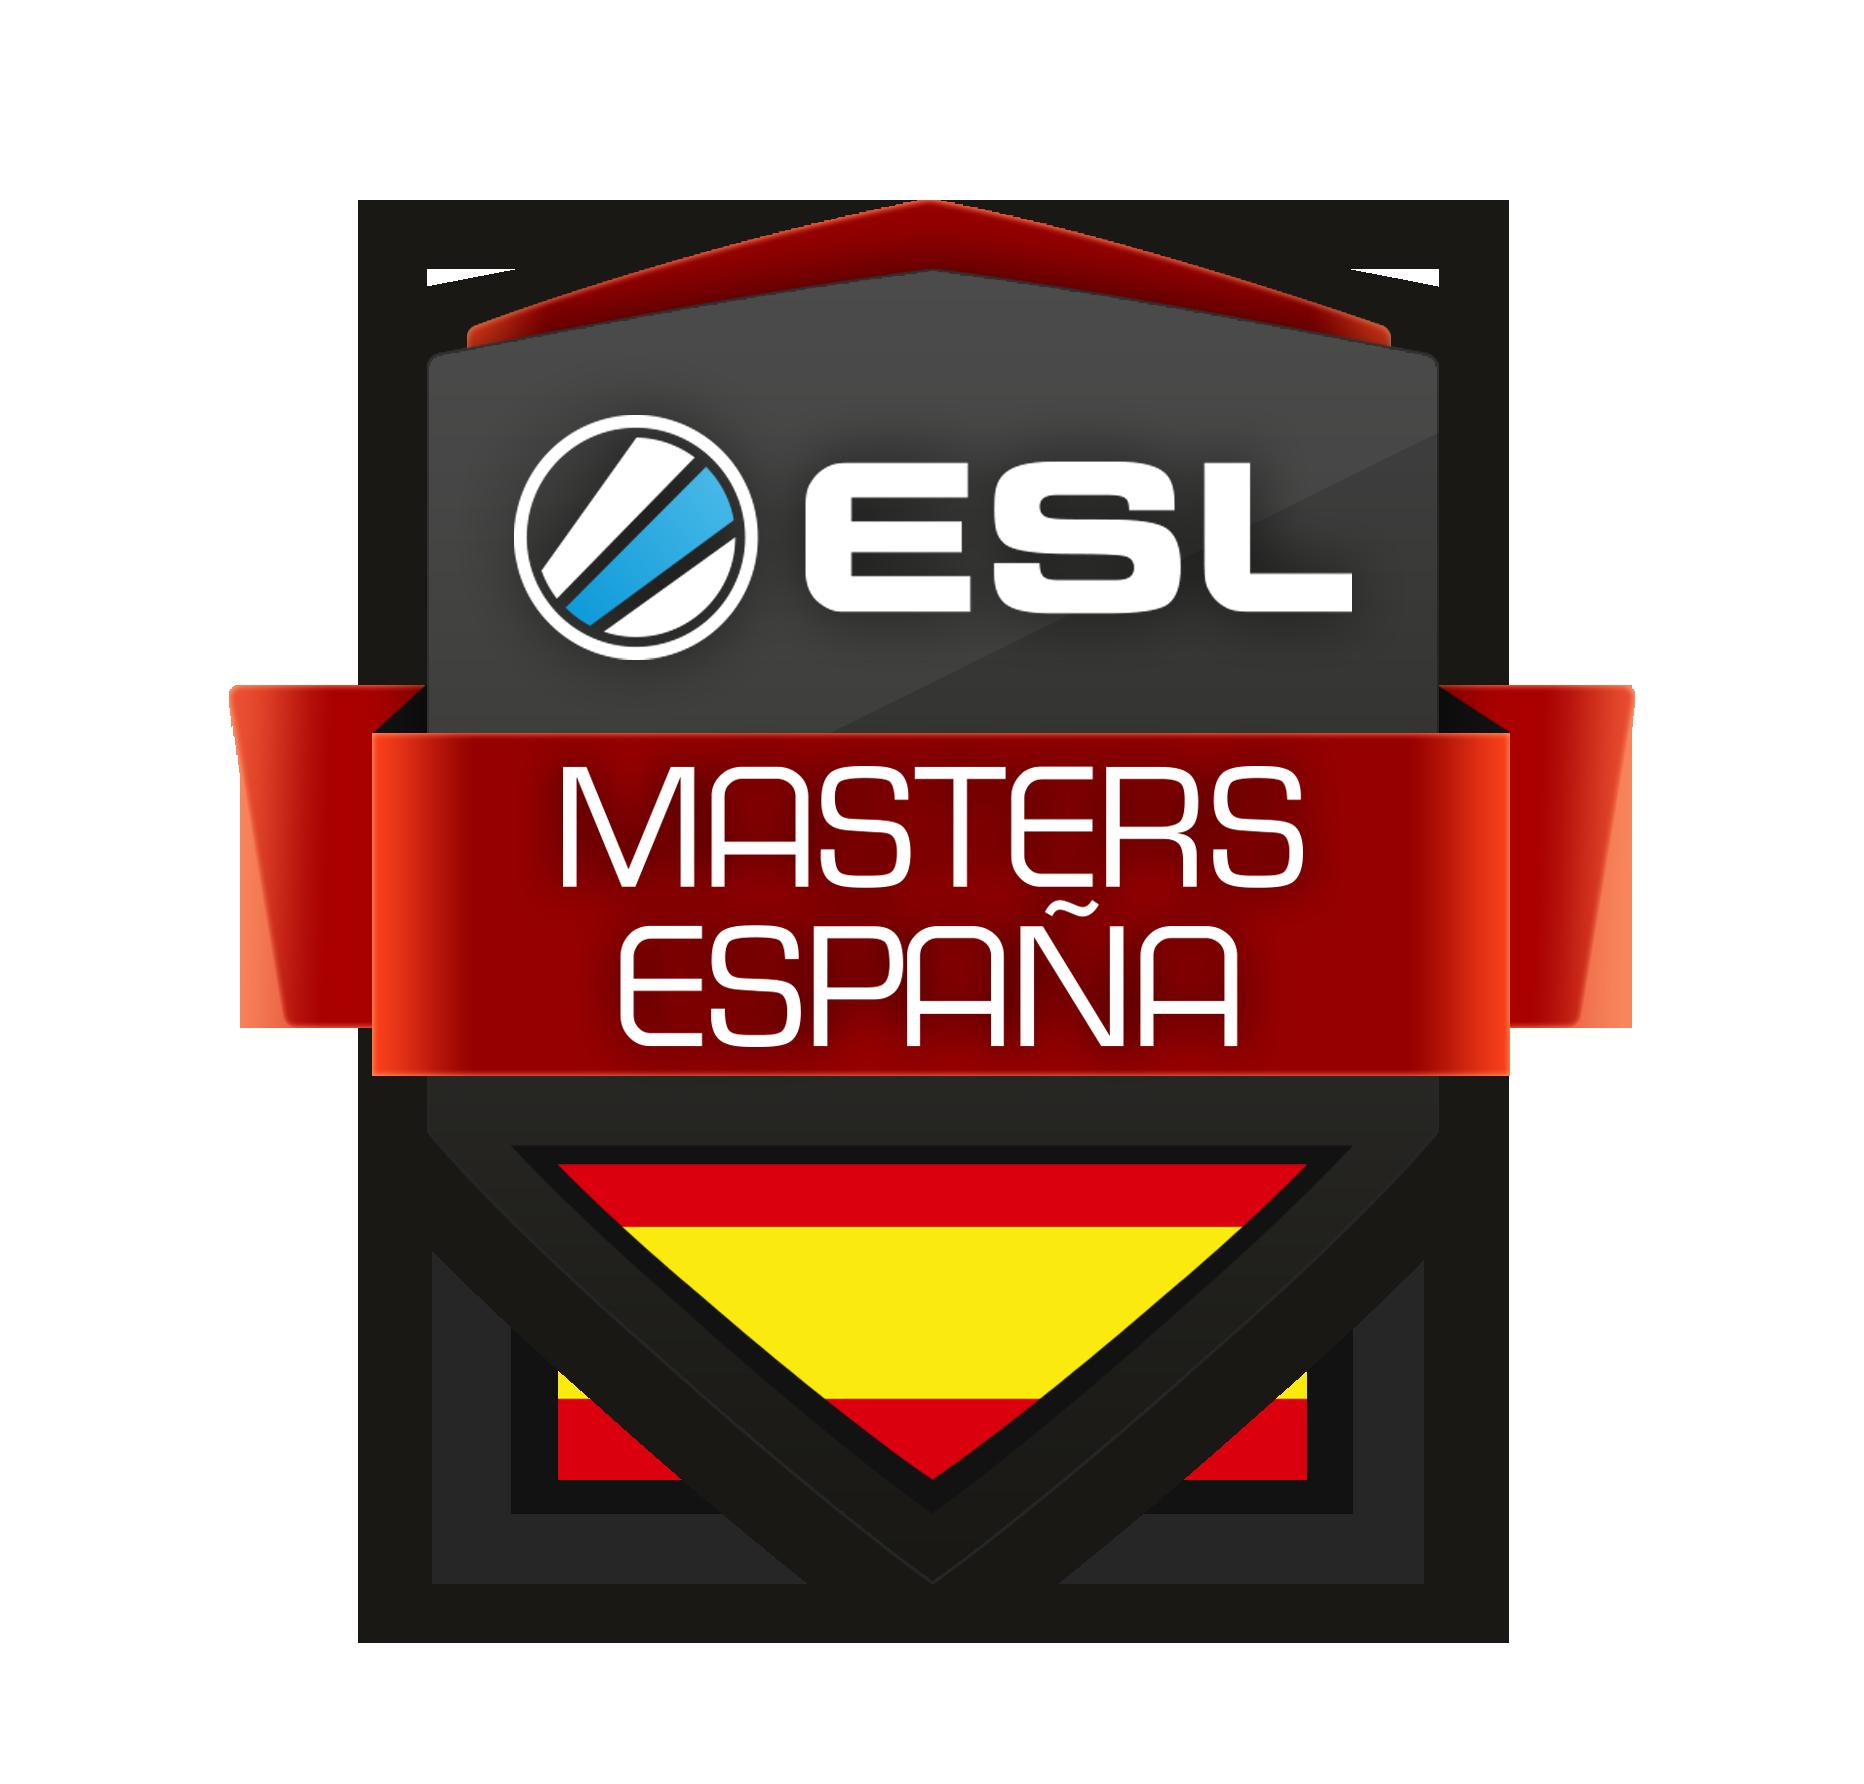 ESL Masters ESPANA